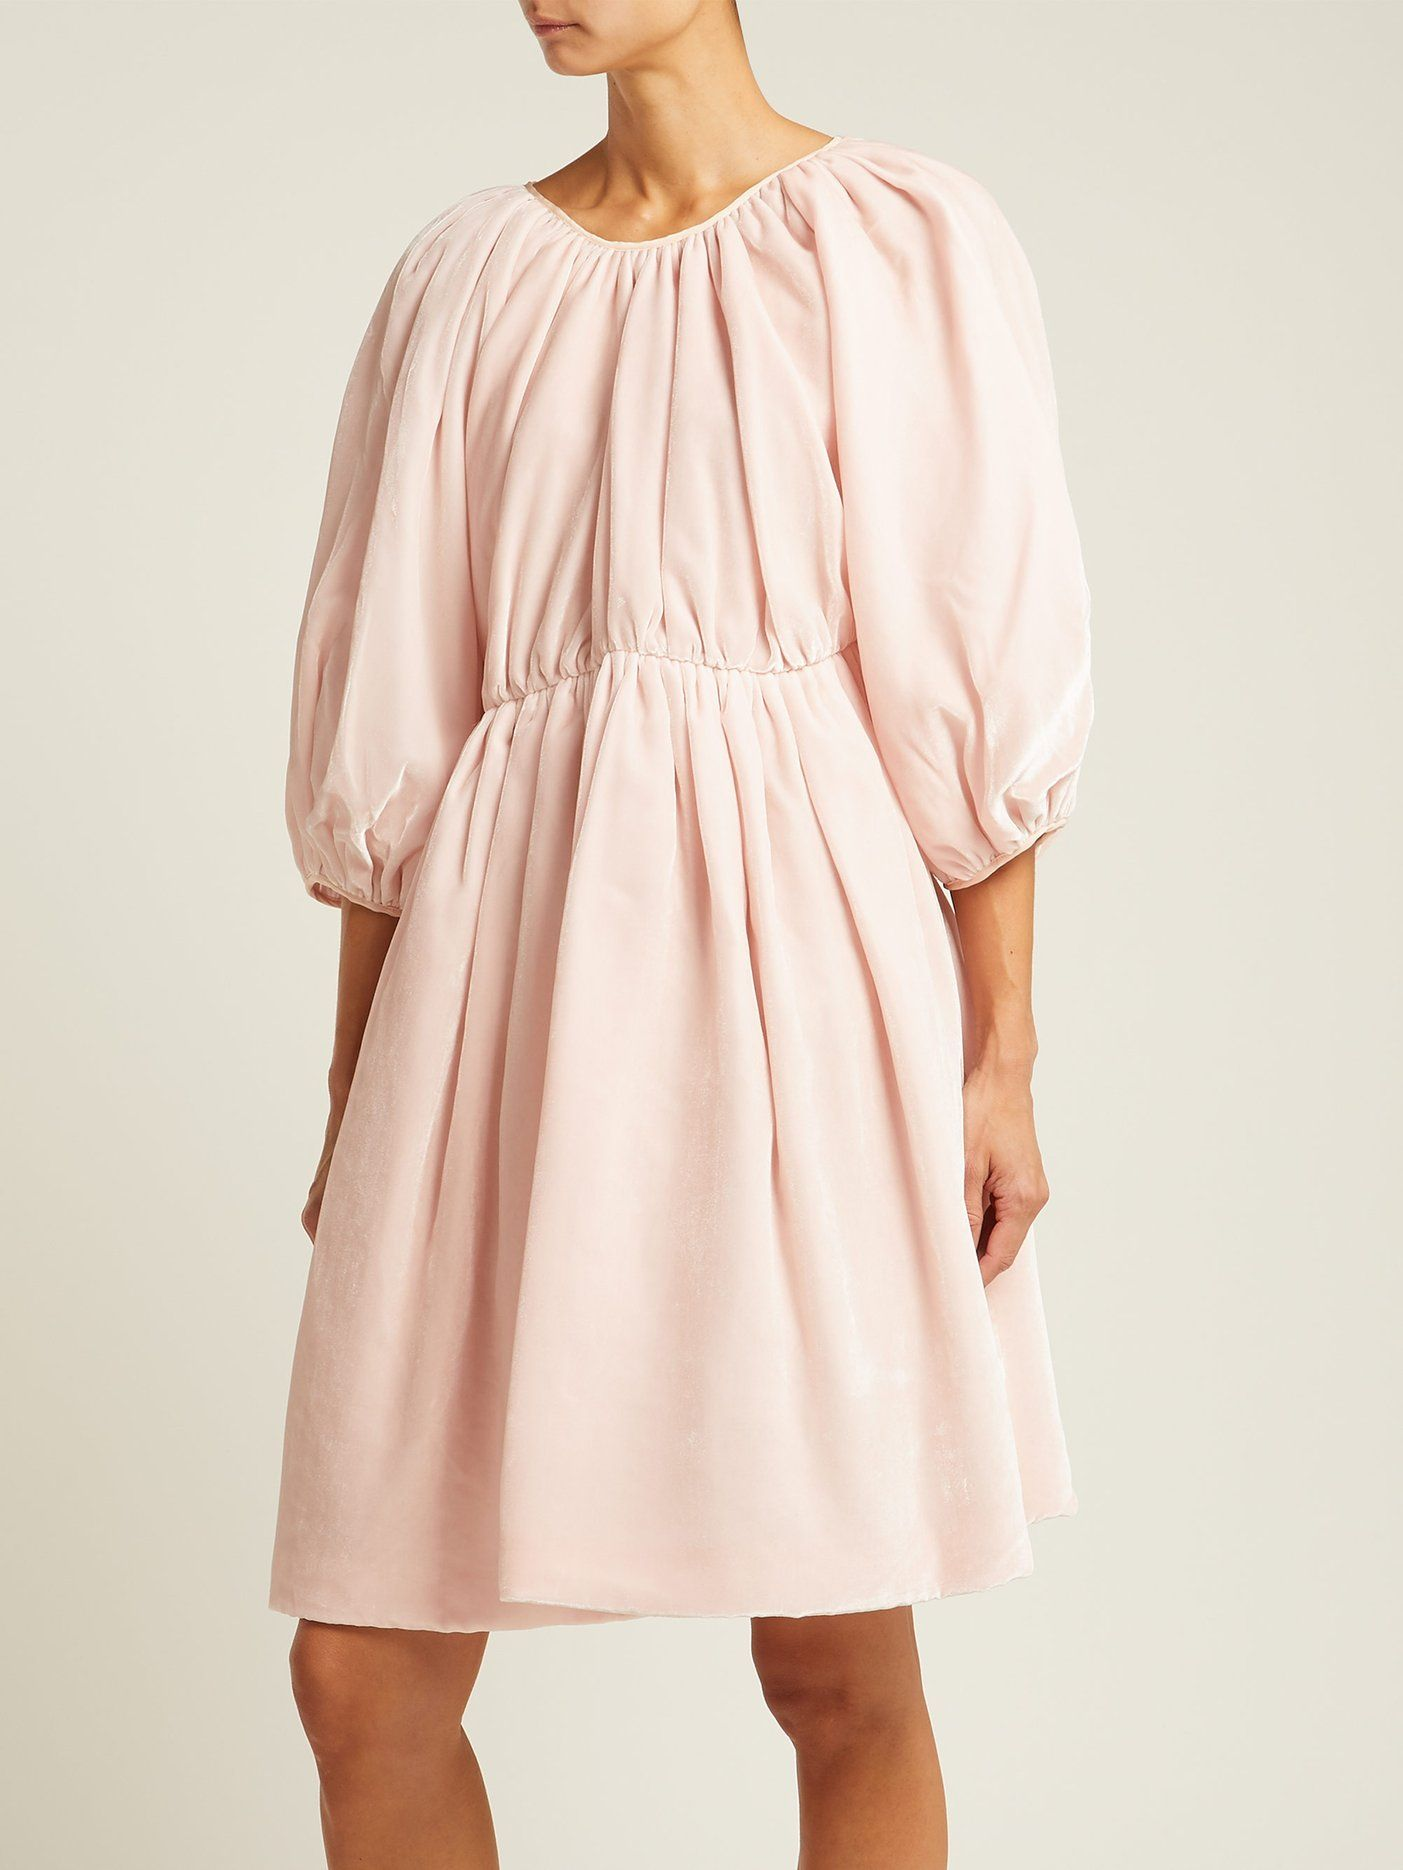 e738b91eafb4 Click here to buy Cecilie Bahnsen Ava velvet mini dress at  MATCHESFASHION.COM